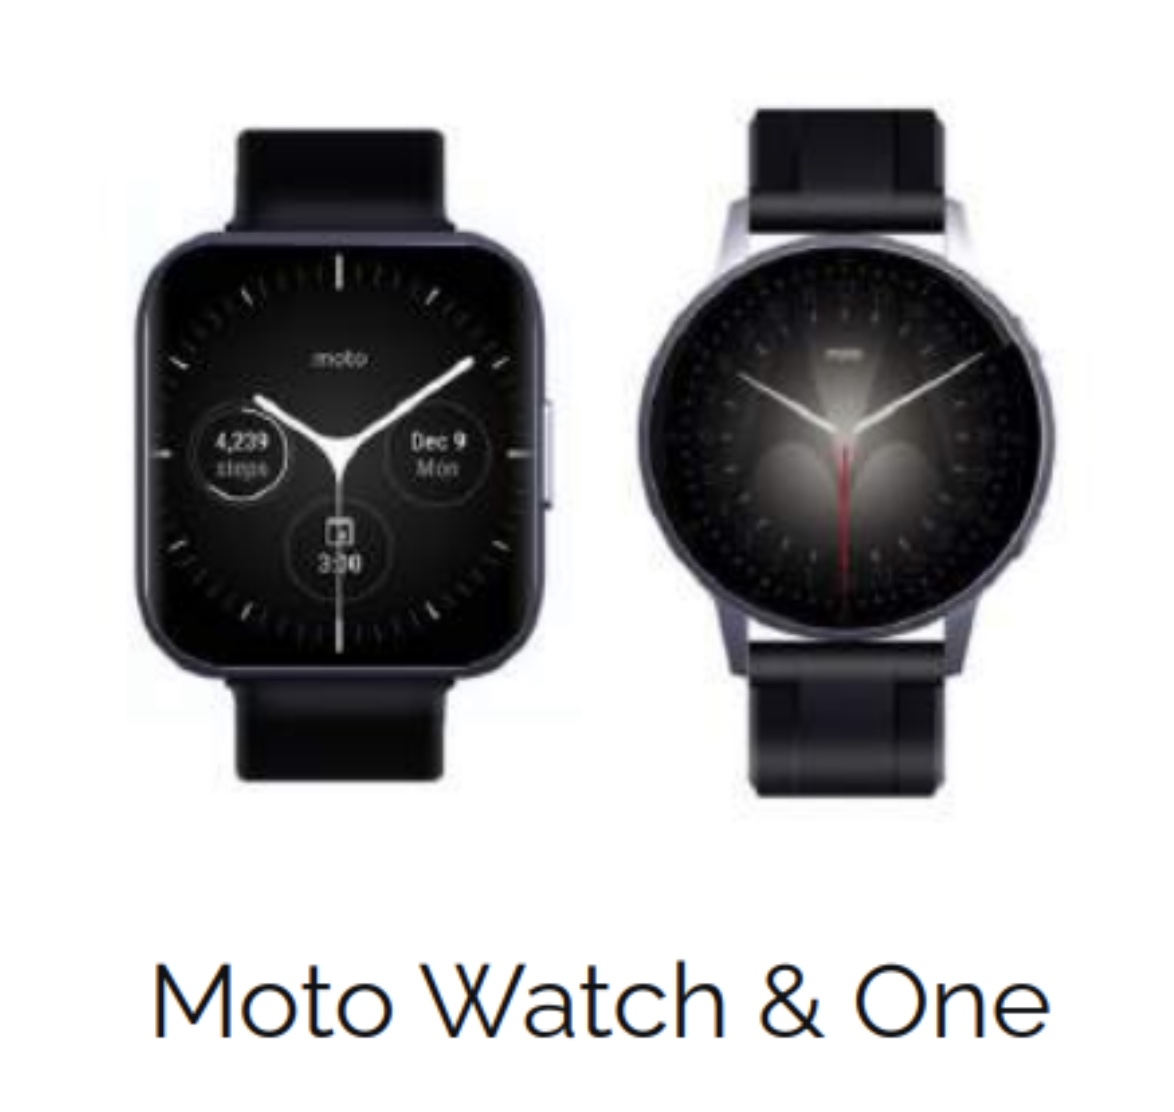 Motorola Moto Watch, Motorola Moto One